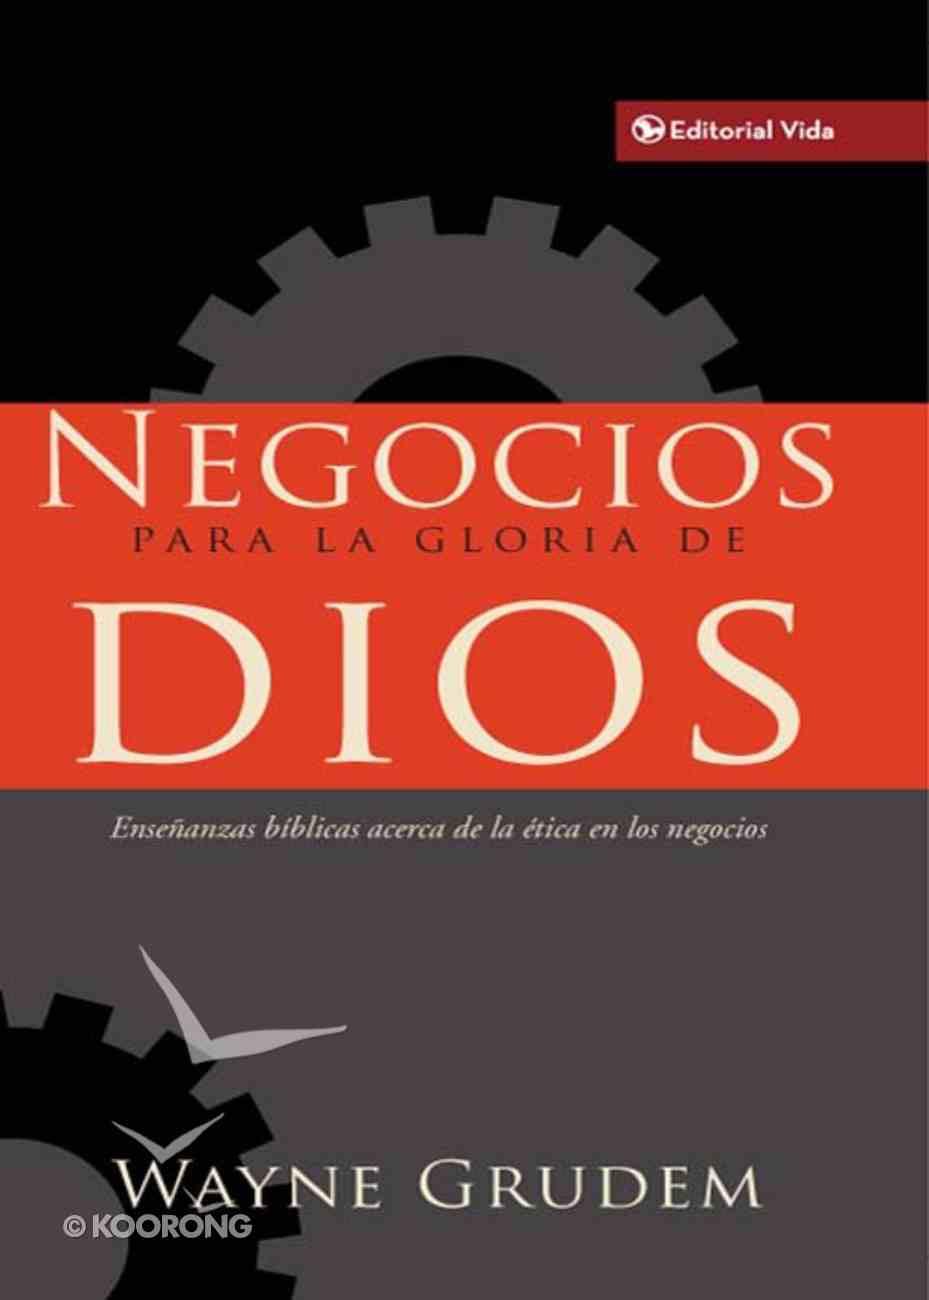 Negocios Para La Gloria De Dios (Spanish) (Spa) (Bible's Teaching On Moral Goodness Of Business) eBook